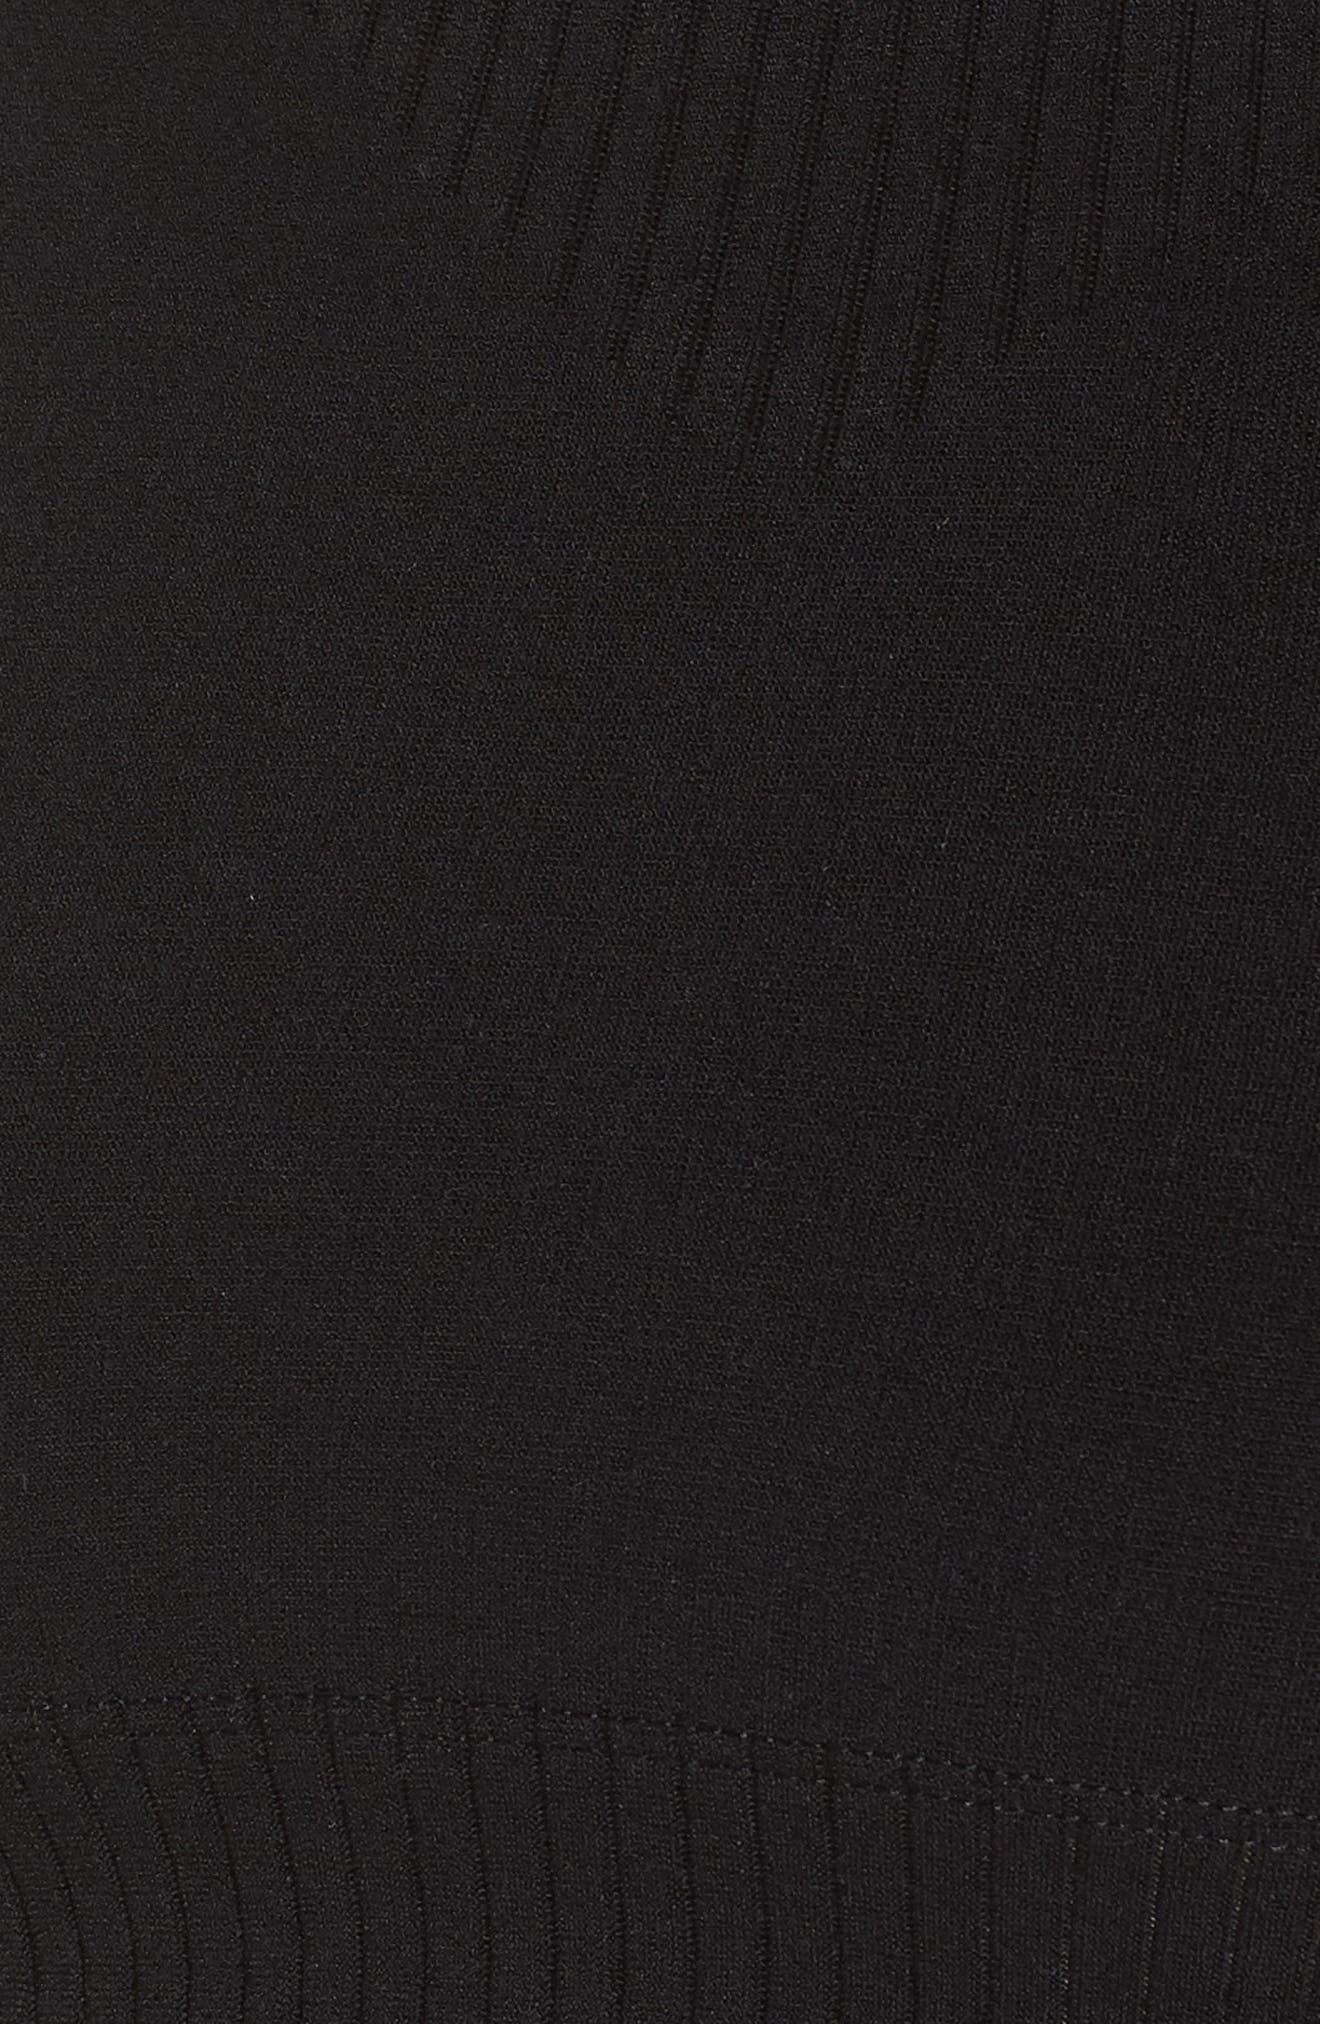 Warpknit Crop Top,                             Alternate thumbnail 6, color,                             BLACK